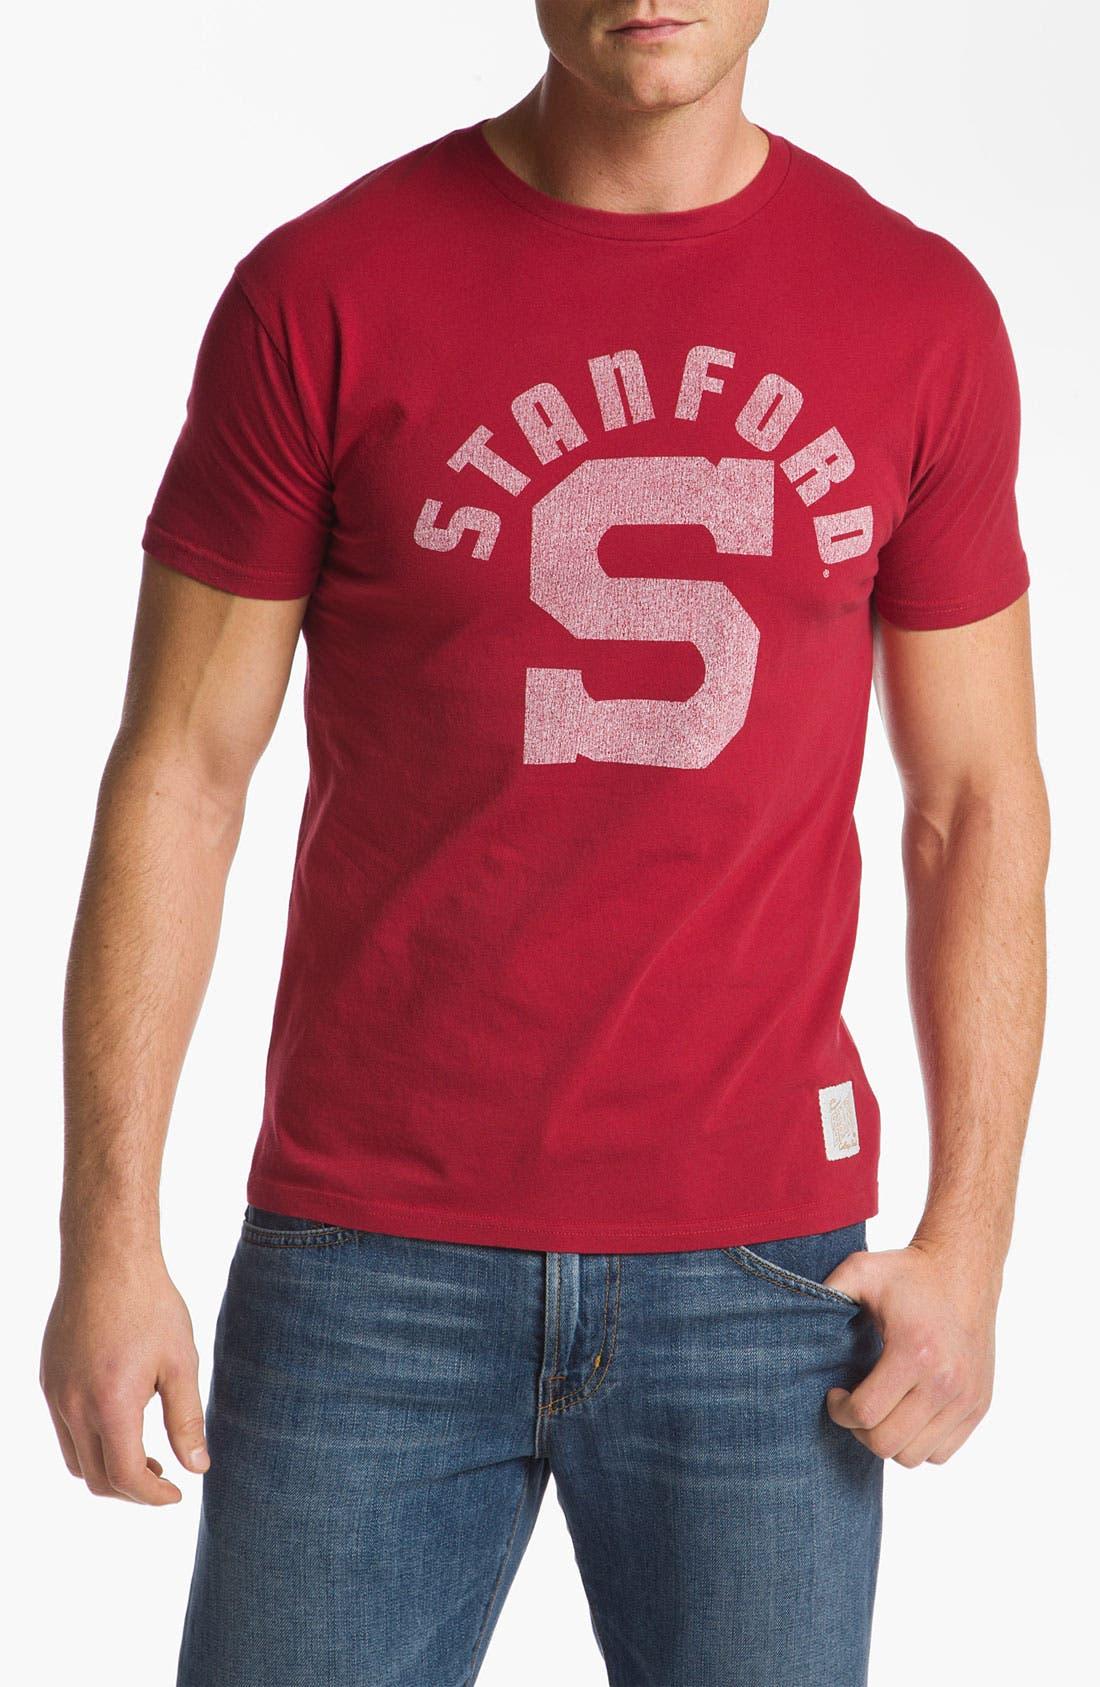 Main Image - The Original Retro Brand 'Stanford Cardinal' T-Shirt